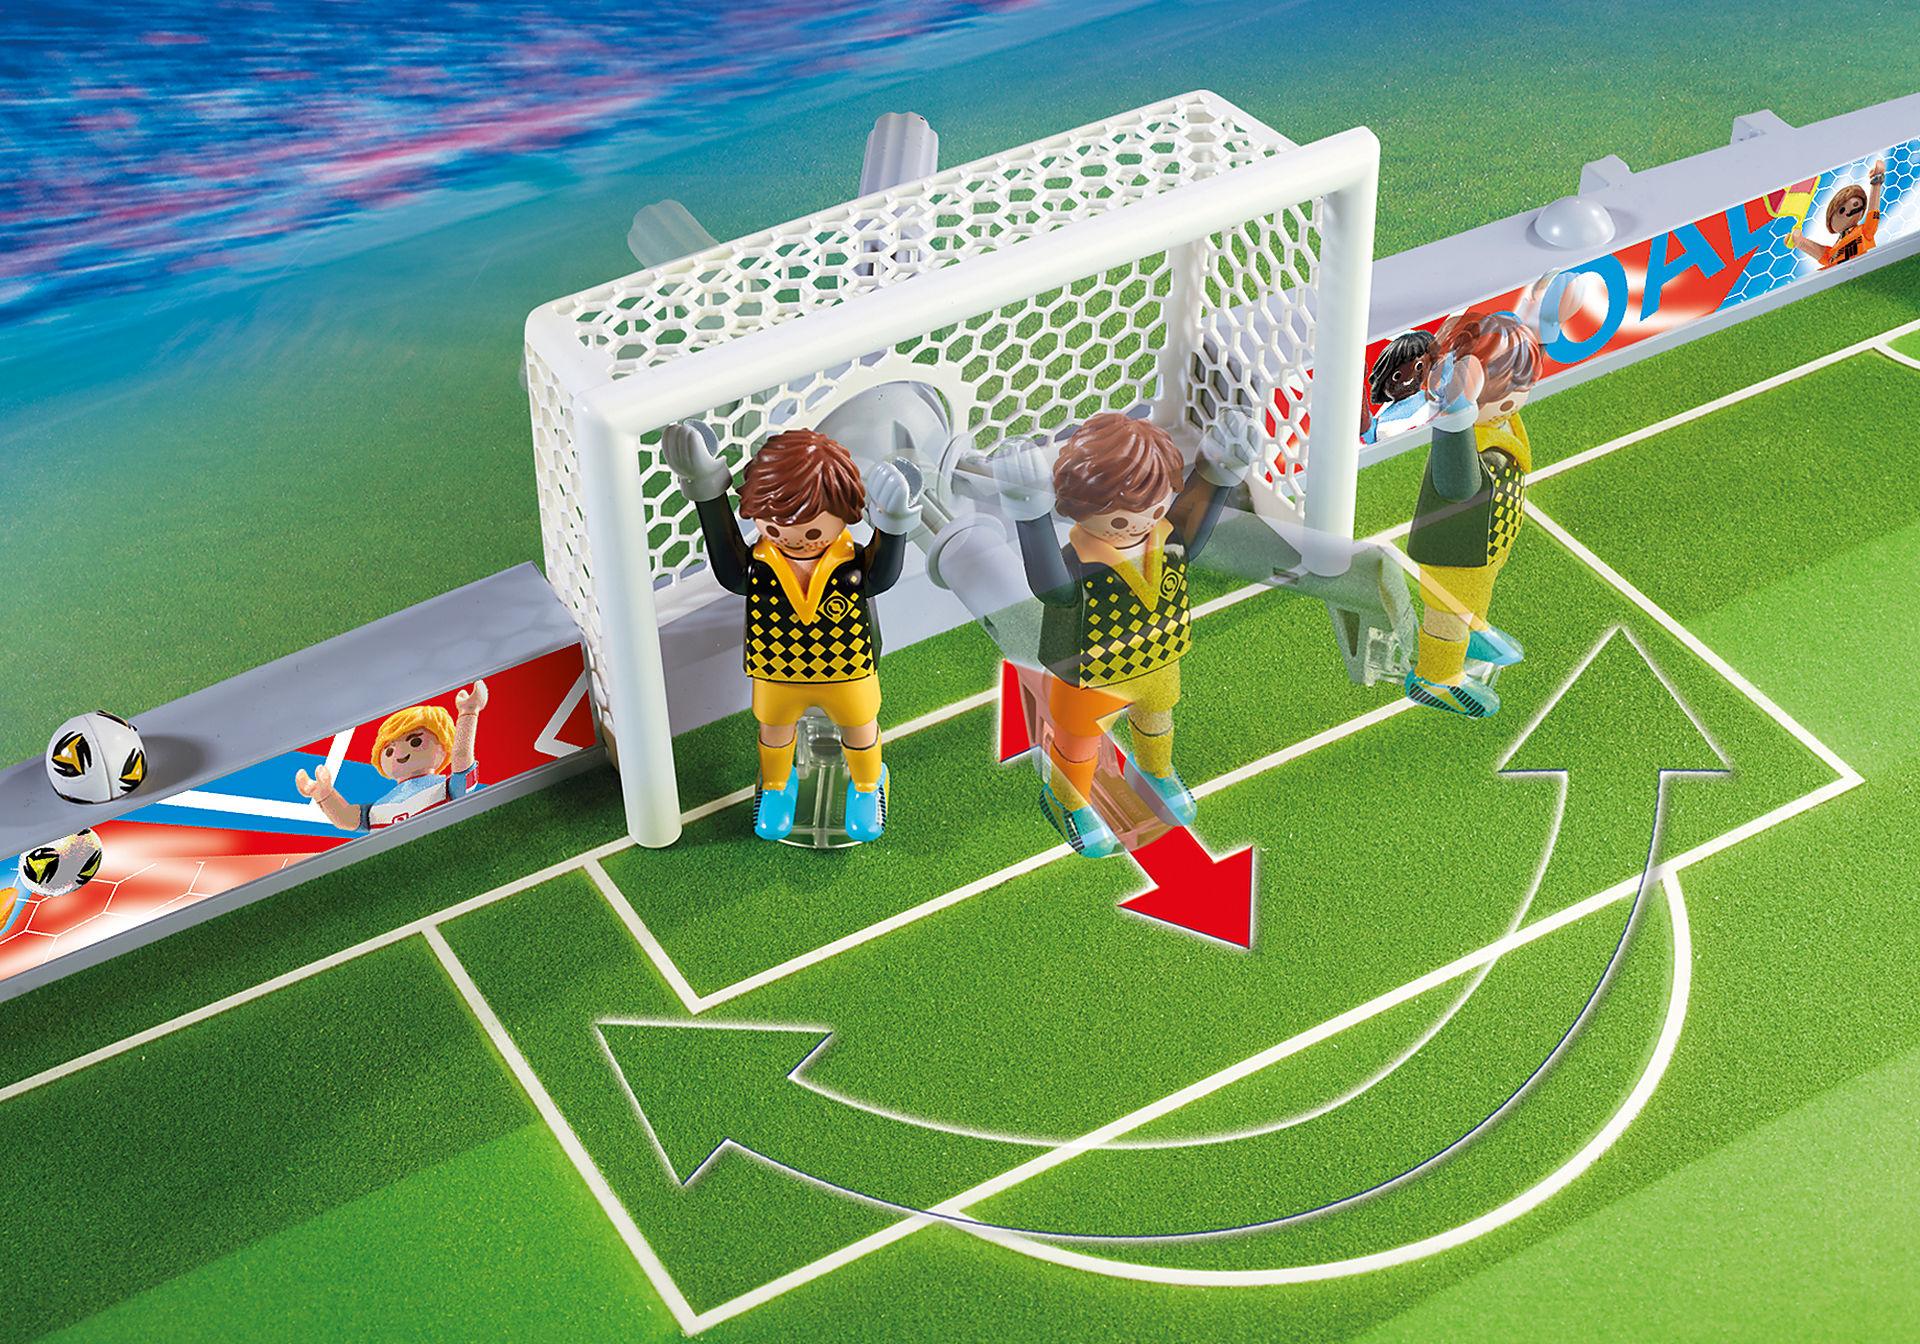 http://media.playmobil.com/i/playmobil/6857_product_extra2/Set de Fútbol Maletín